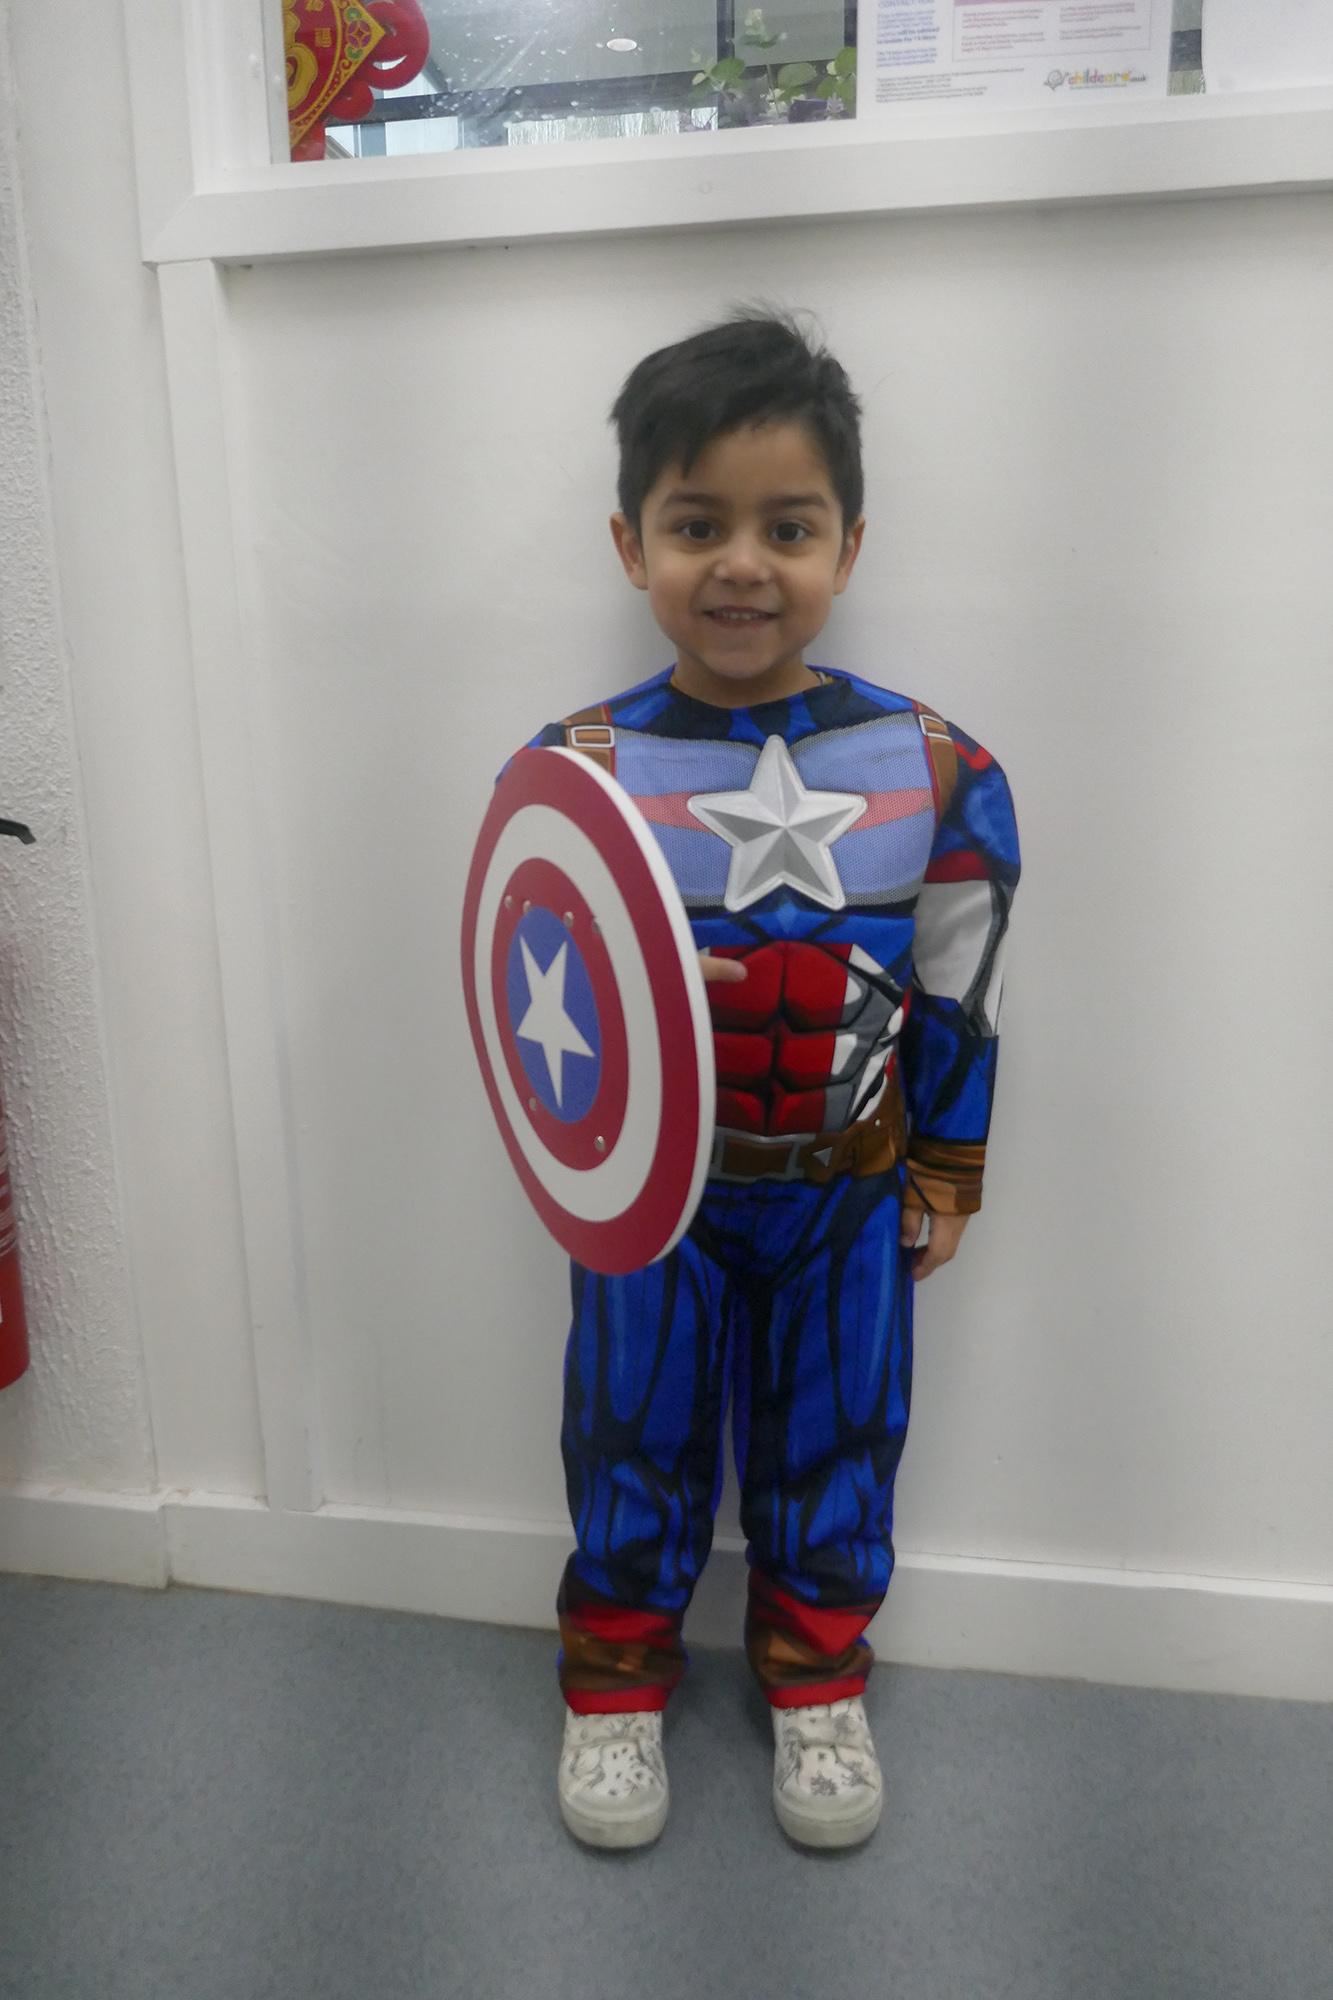 Child dressed as Captain America